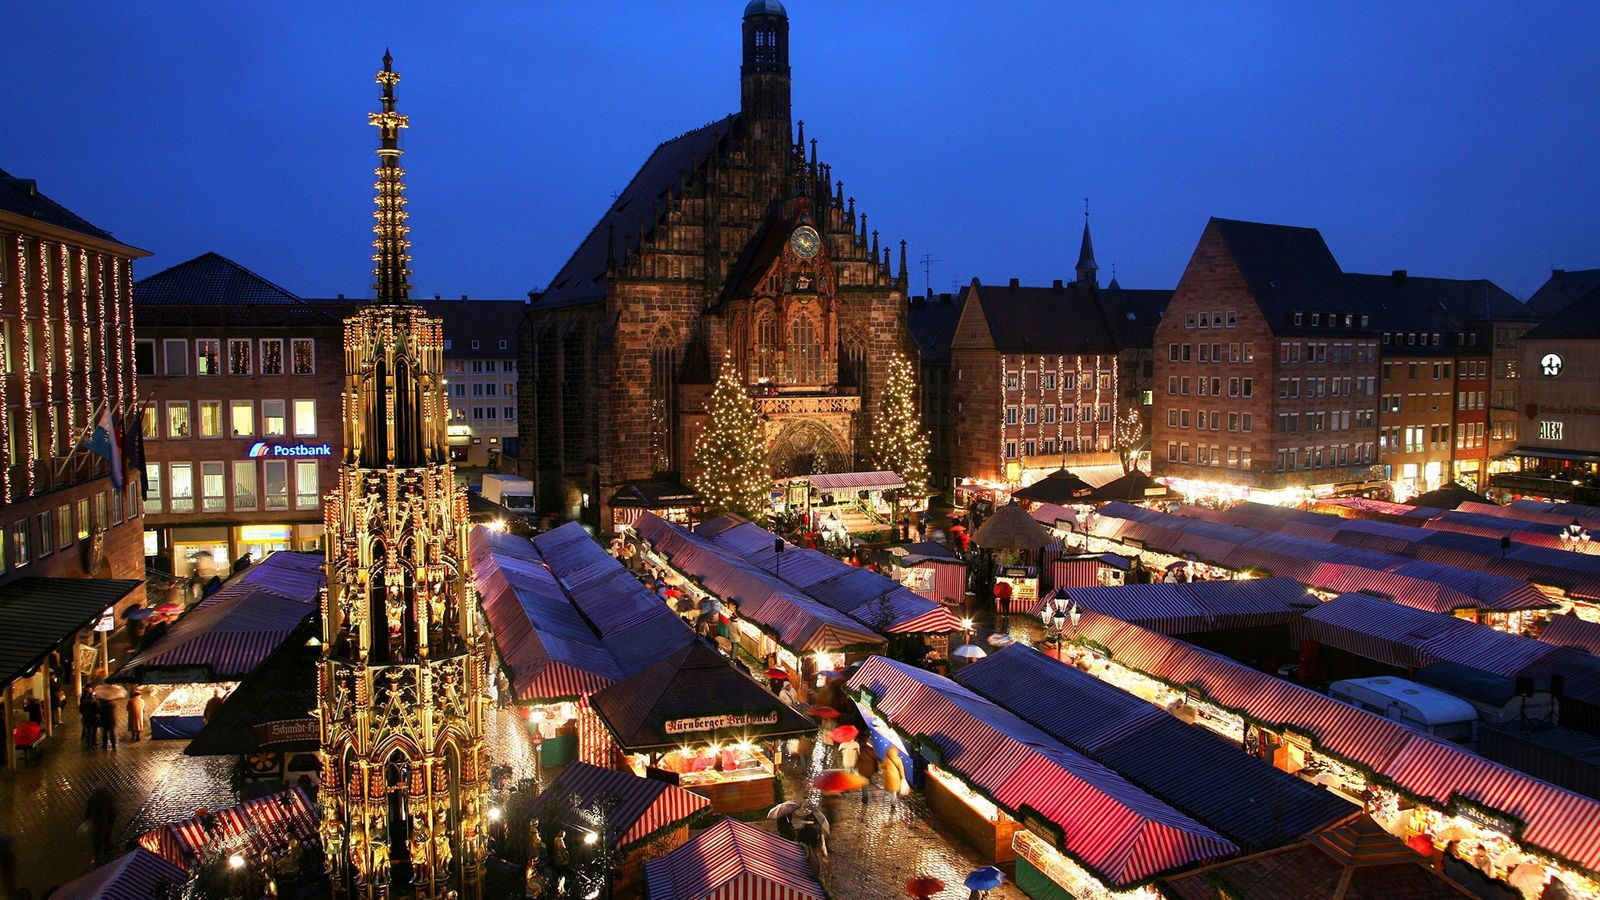 The Nuremburg Christmas Market dates back 400 years.